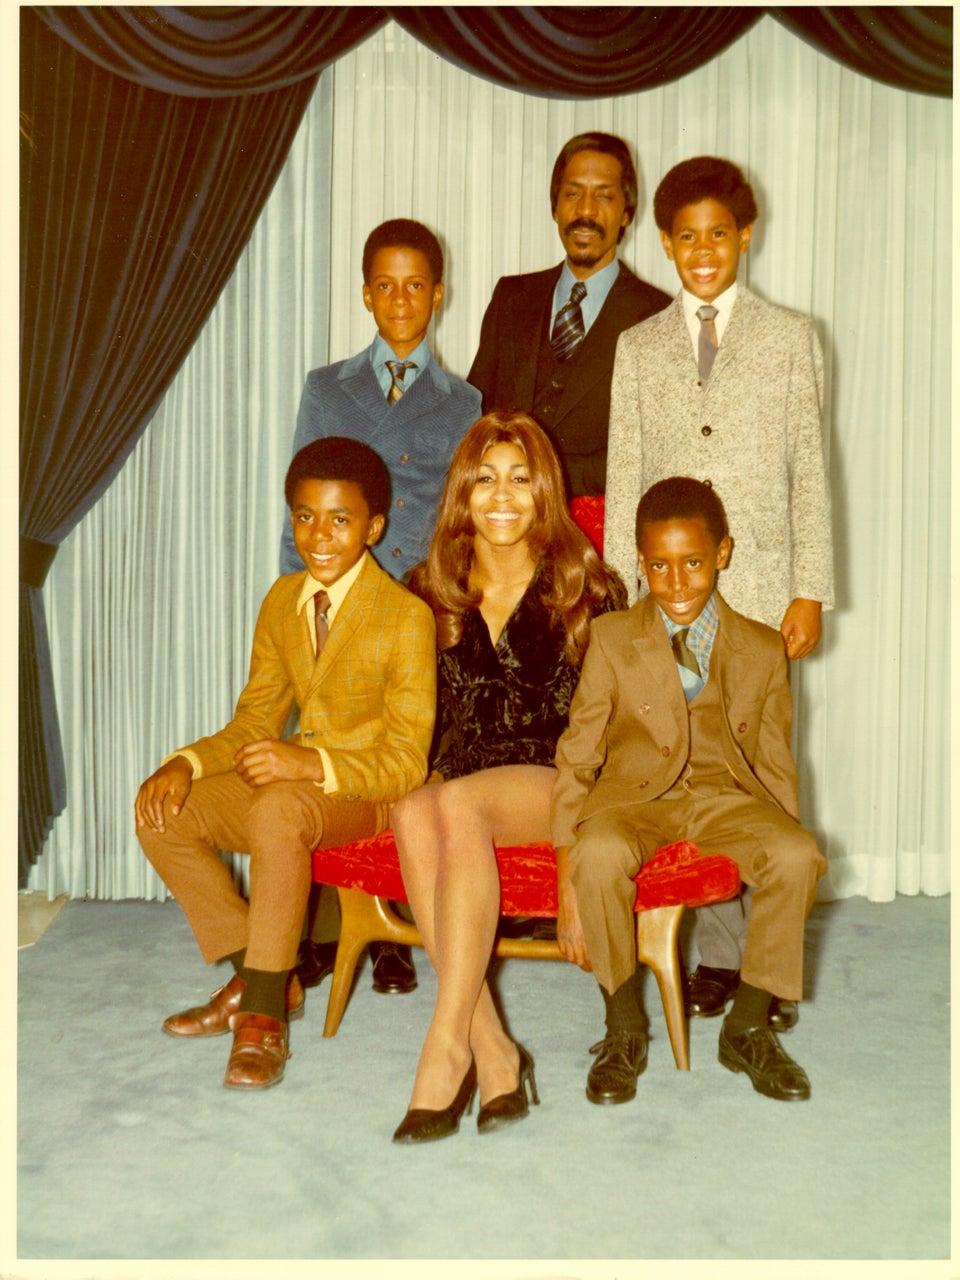 Tina Turner's Oldest Son Dead Of Apparent Suicide